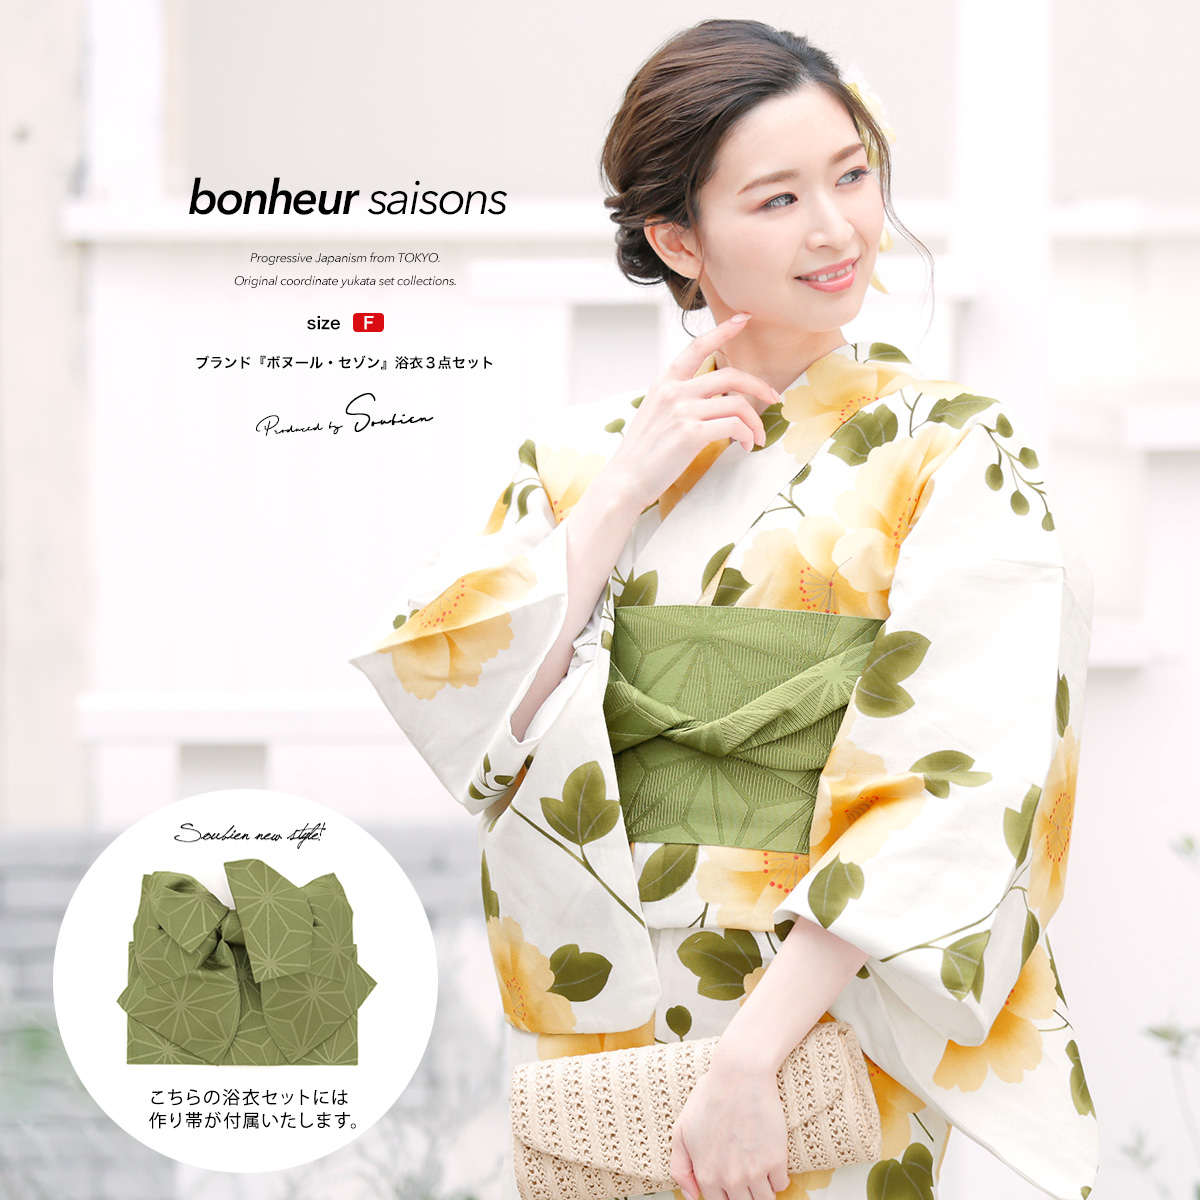 d05a670275f46 浴衣 3点セット(浴衣 着付け小物 作り帯 下駄) bonheur saisons 白 ...